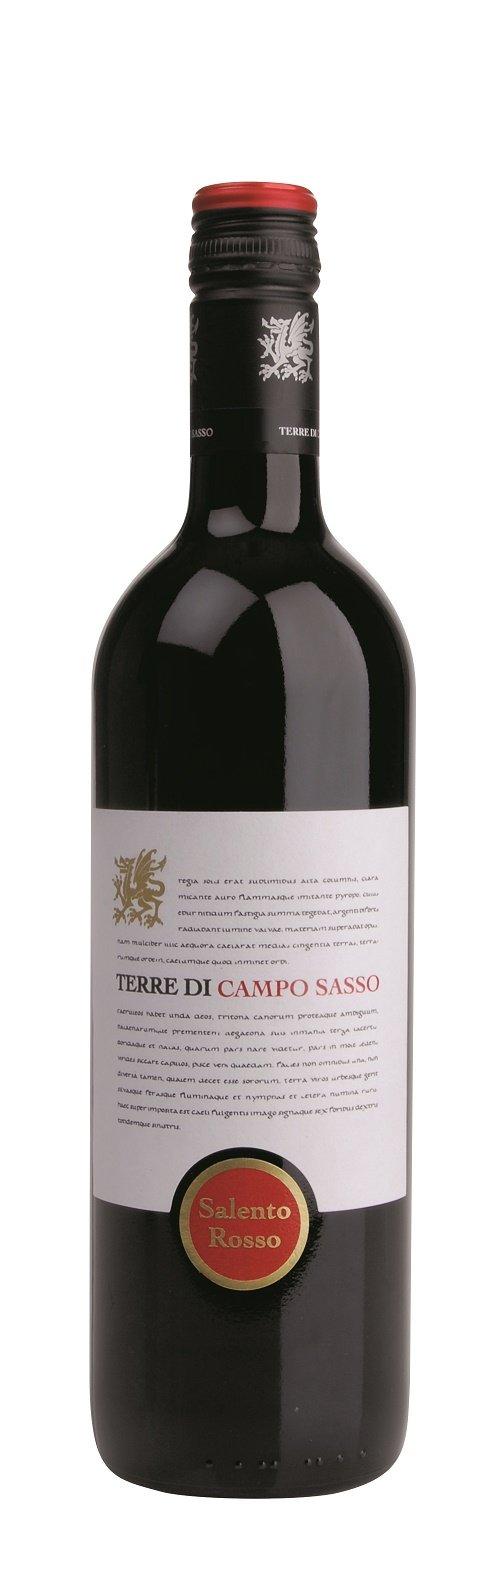 6x-075l-2015er-Terre-di-Campo-Sasso-Rosso-Salento-IGP-Apulien-Italien-Rotwein-trocken